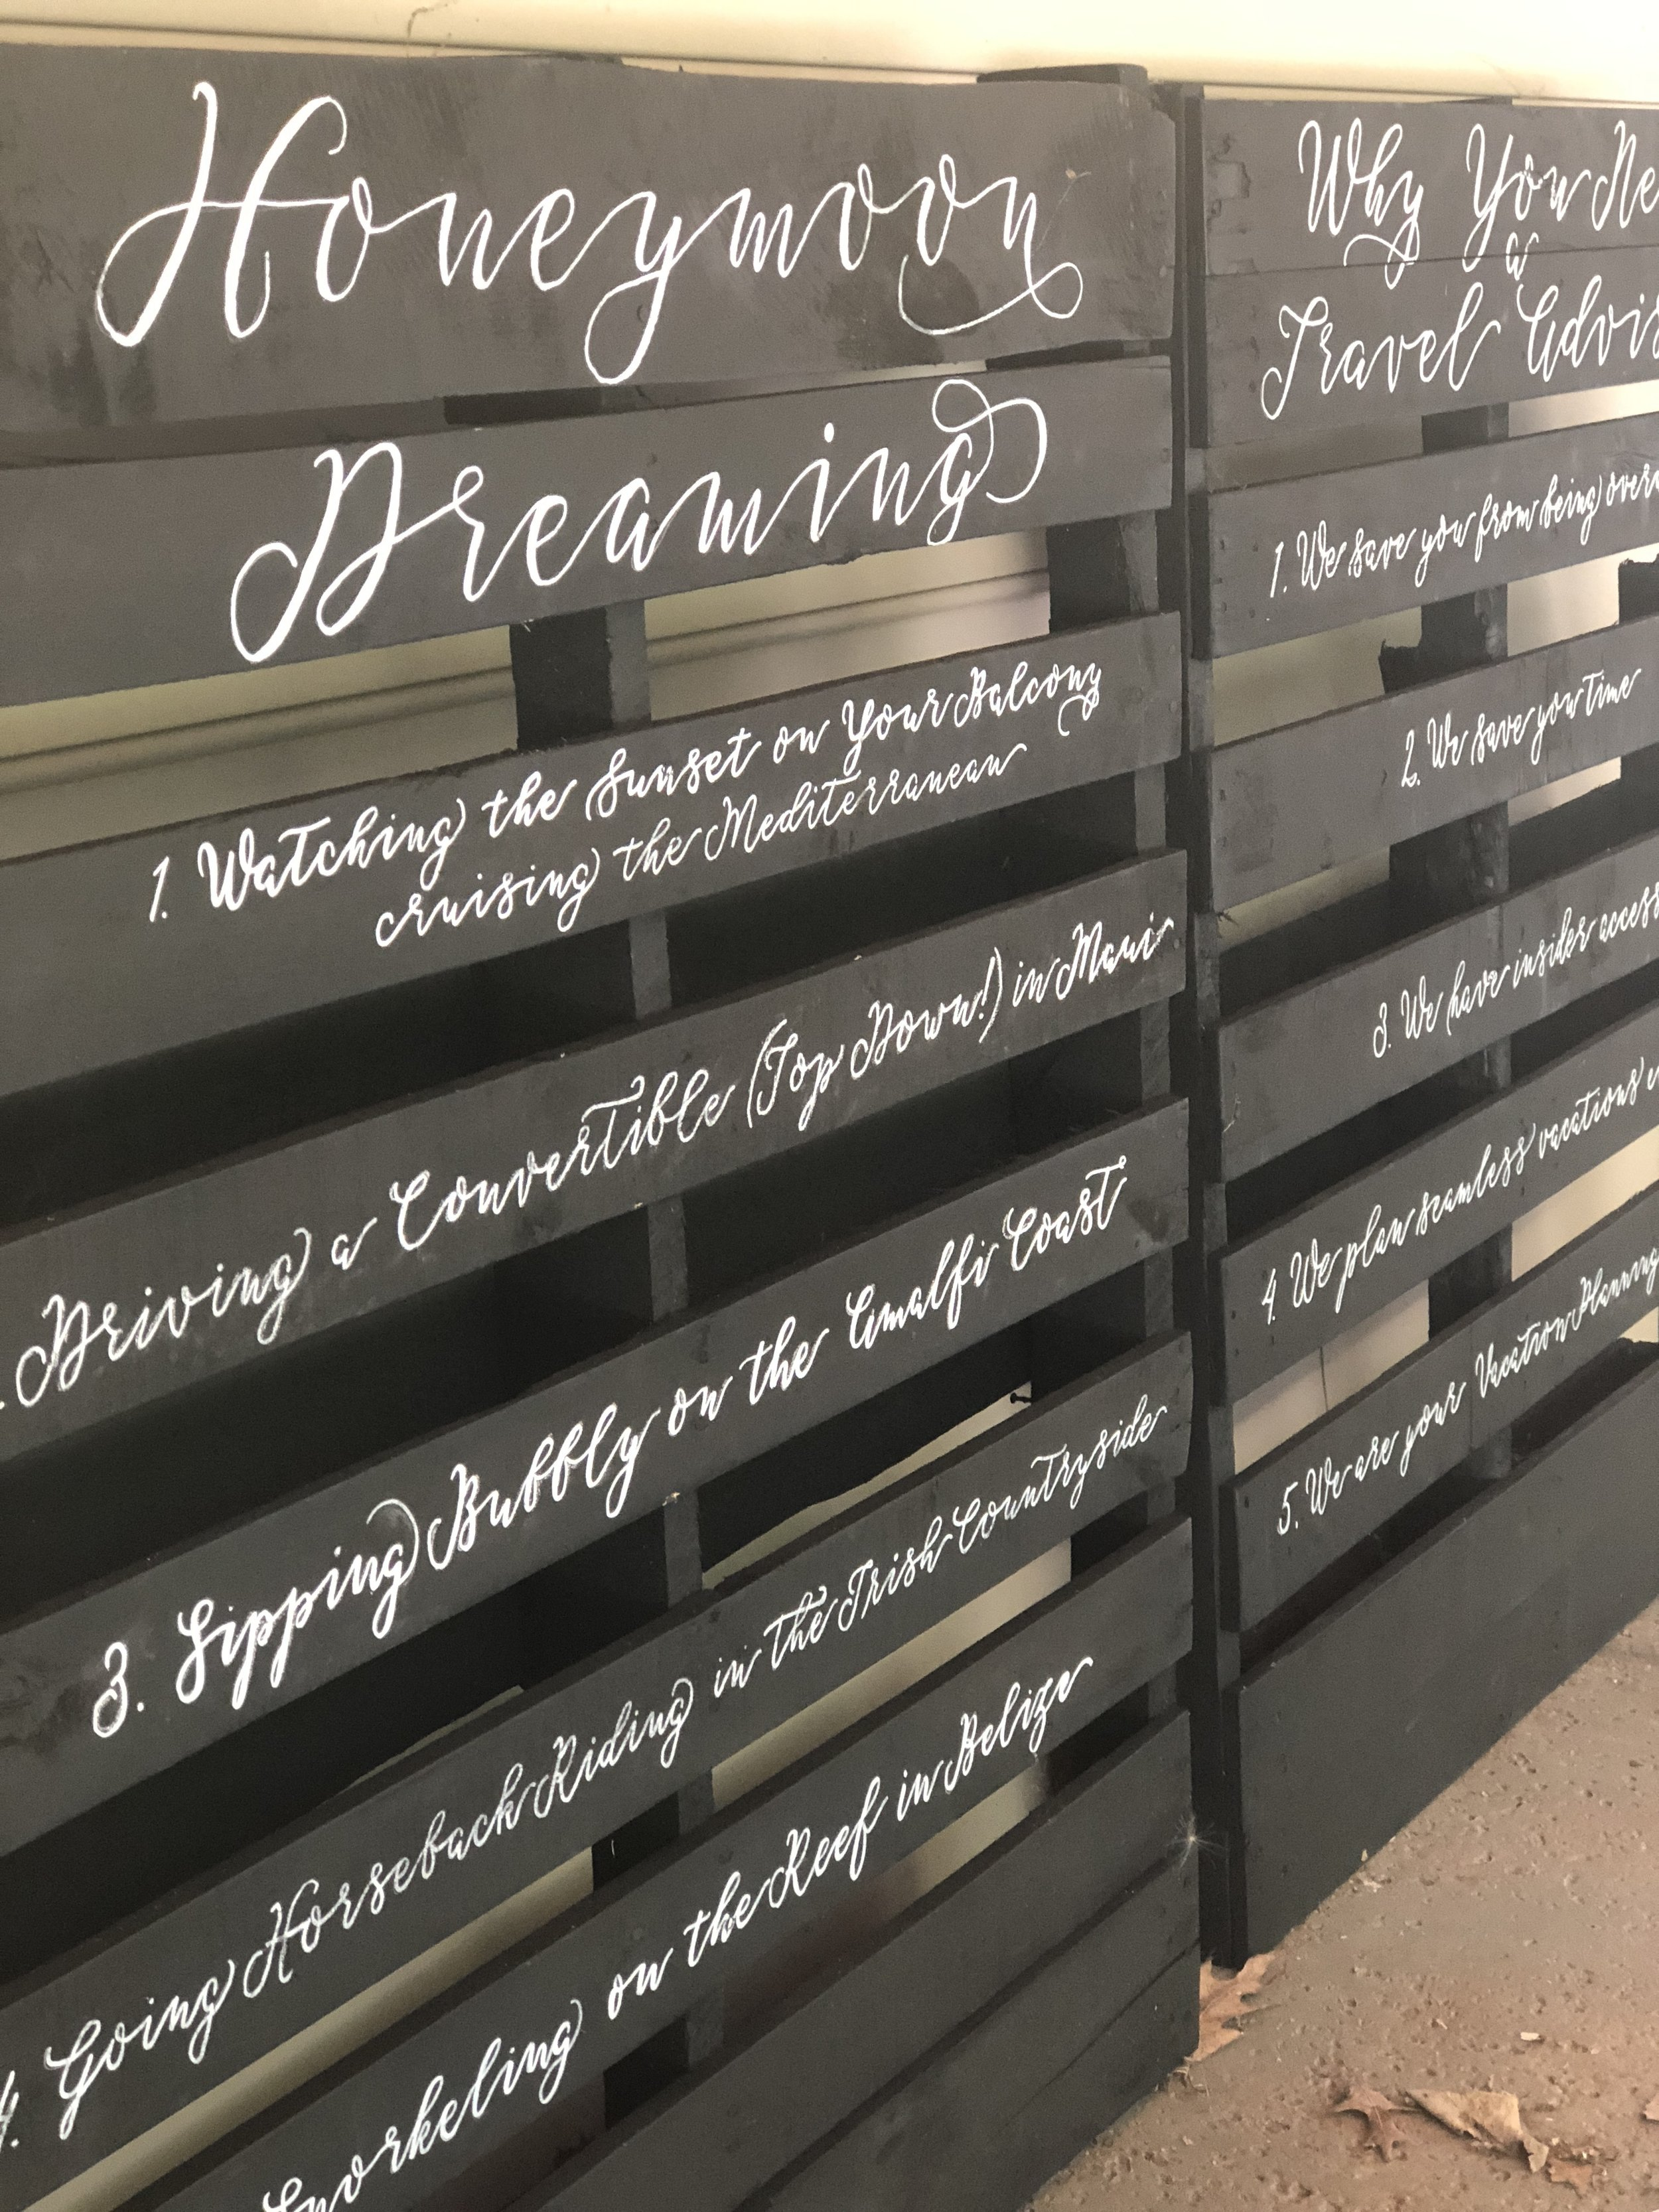 Central PA, York PA, JesSmith Designs, custom, wedding, invitations, bridal, Harrisburg, hanover, calligraphy, baltimore, wedding invitations, lancaster, gettysburg, 07-16 15.51.20.jpg